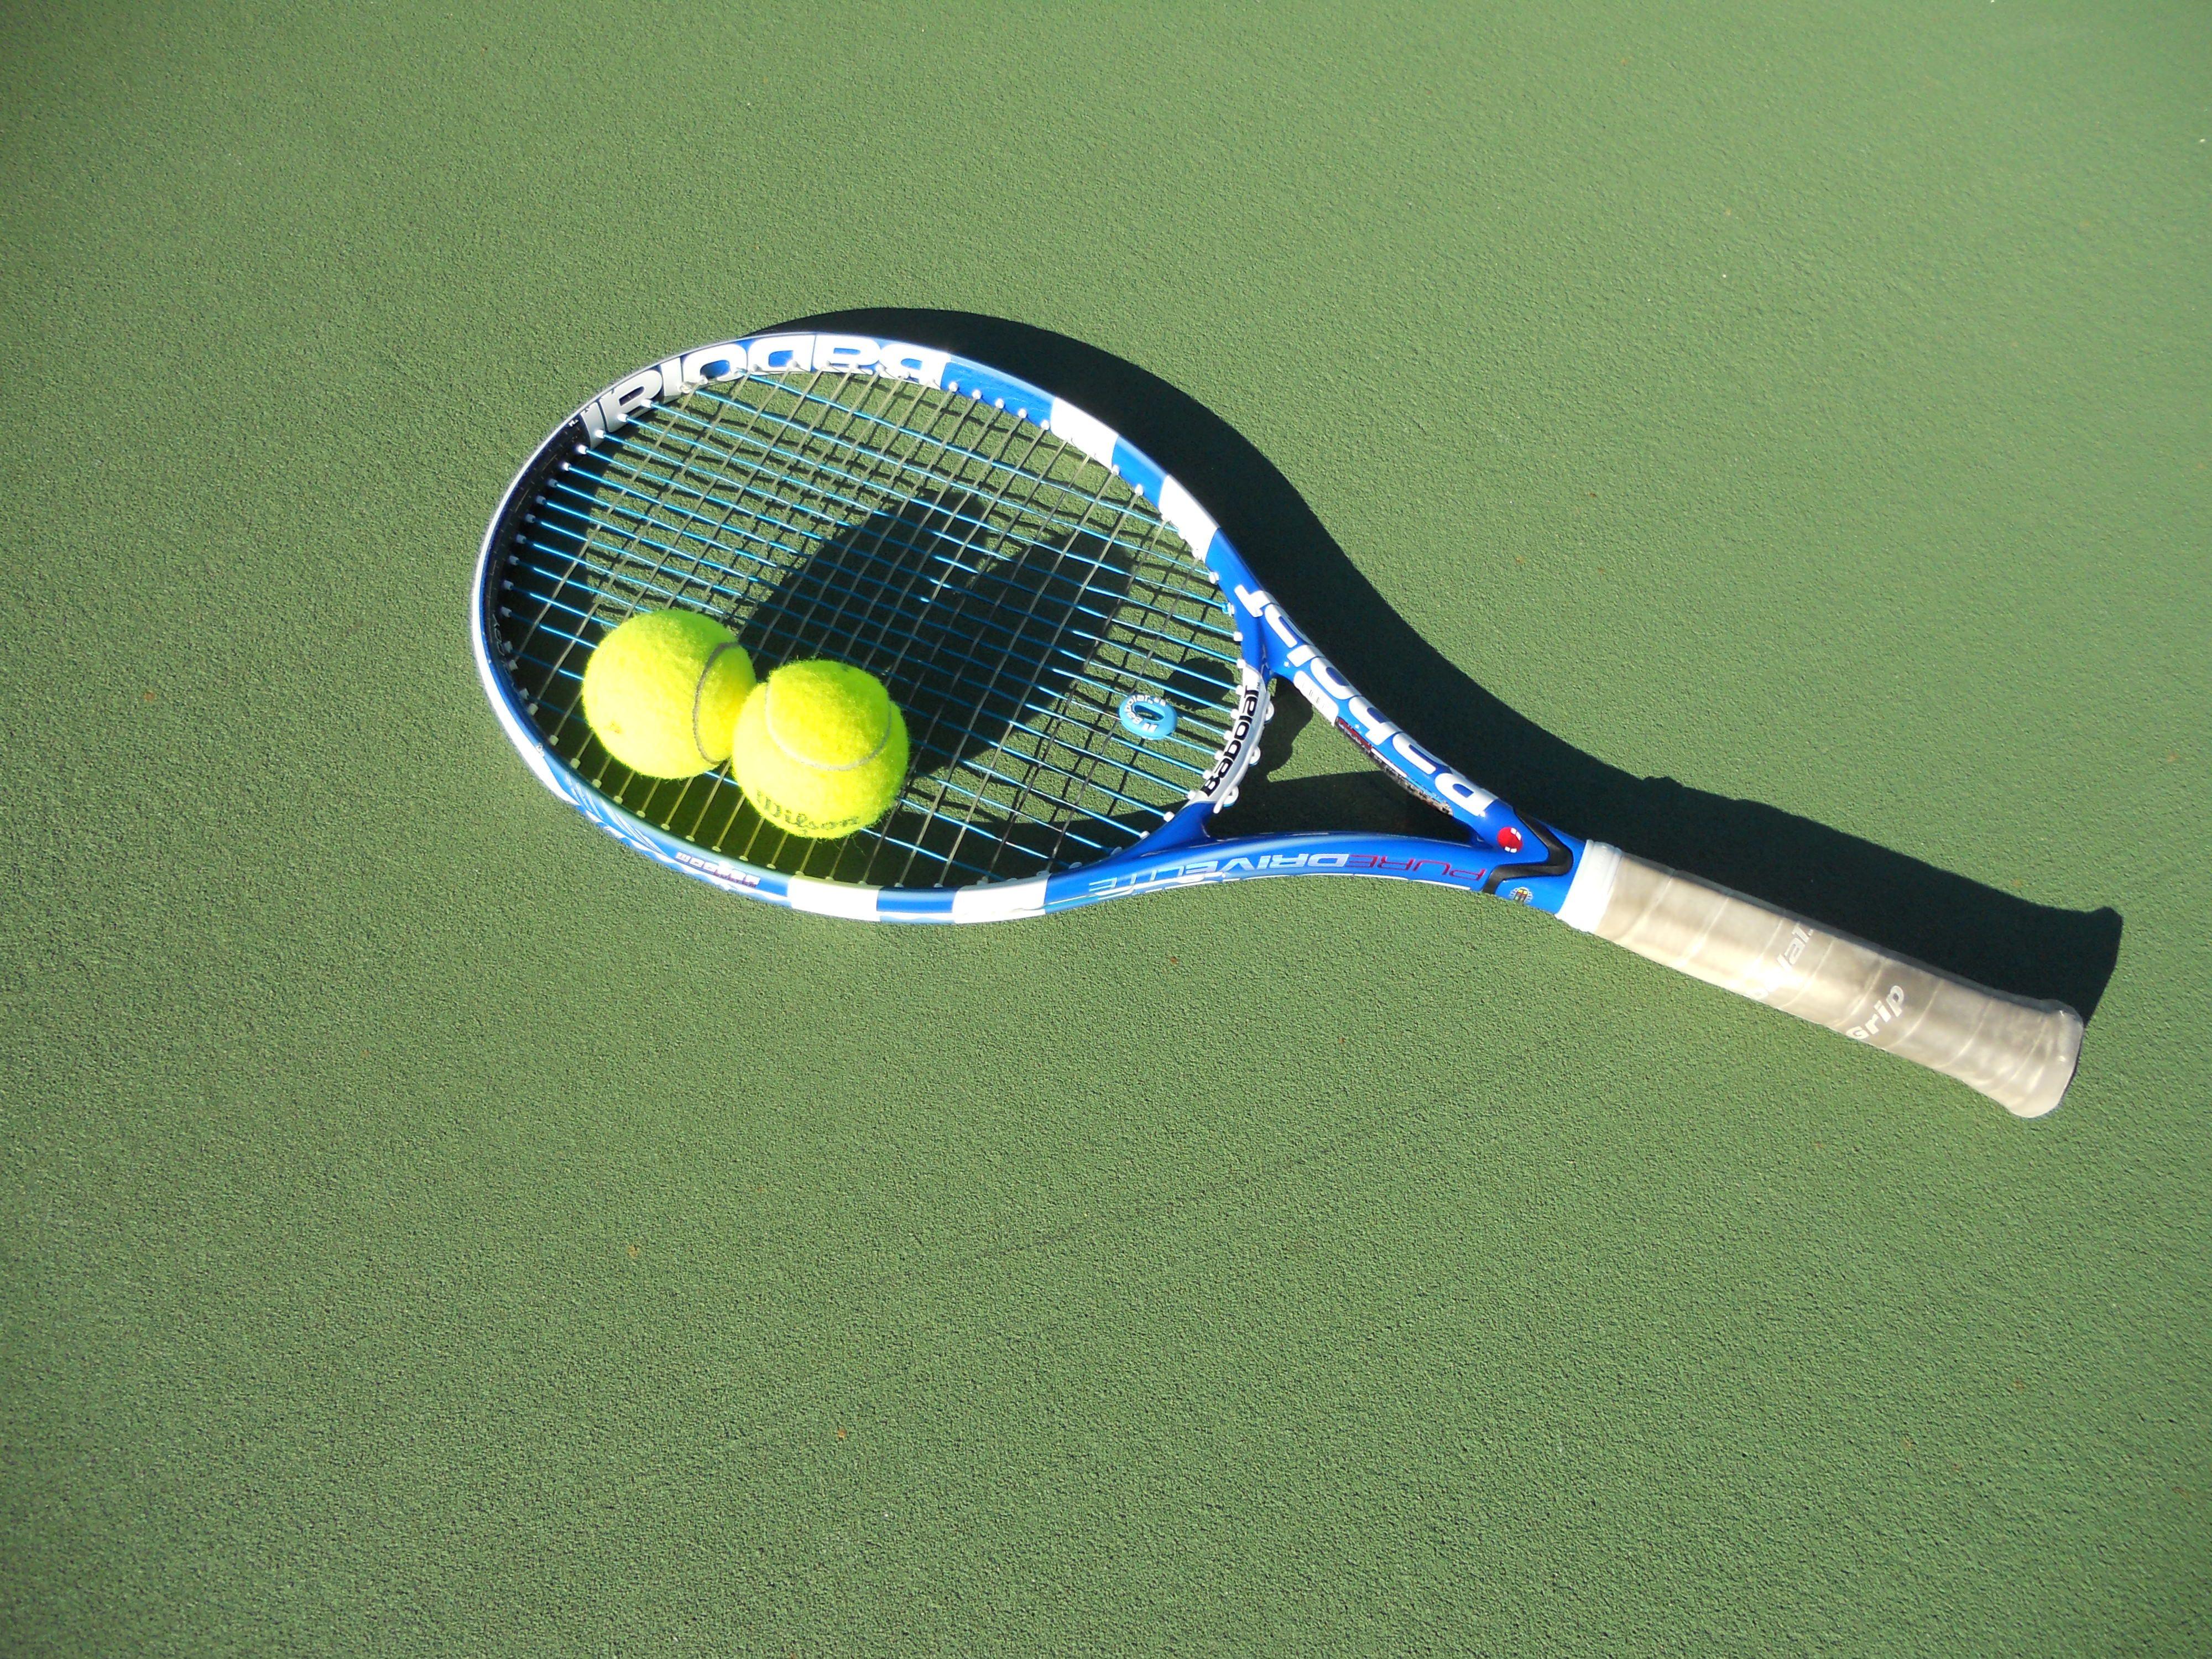 tennis news more news social tennis 2 aug 2013 social